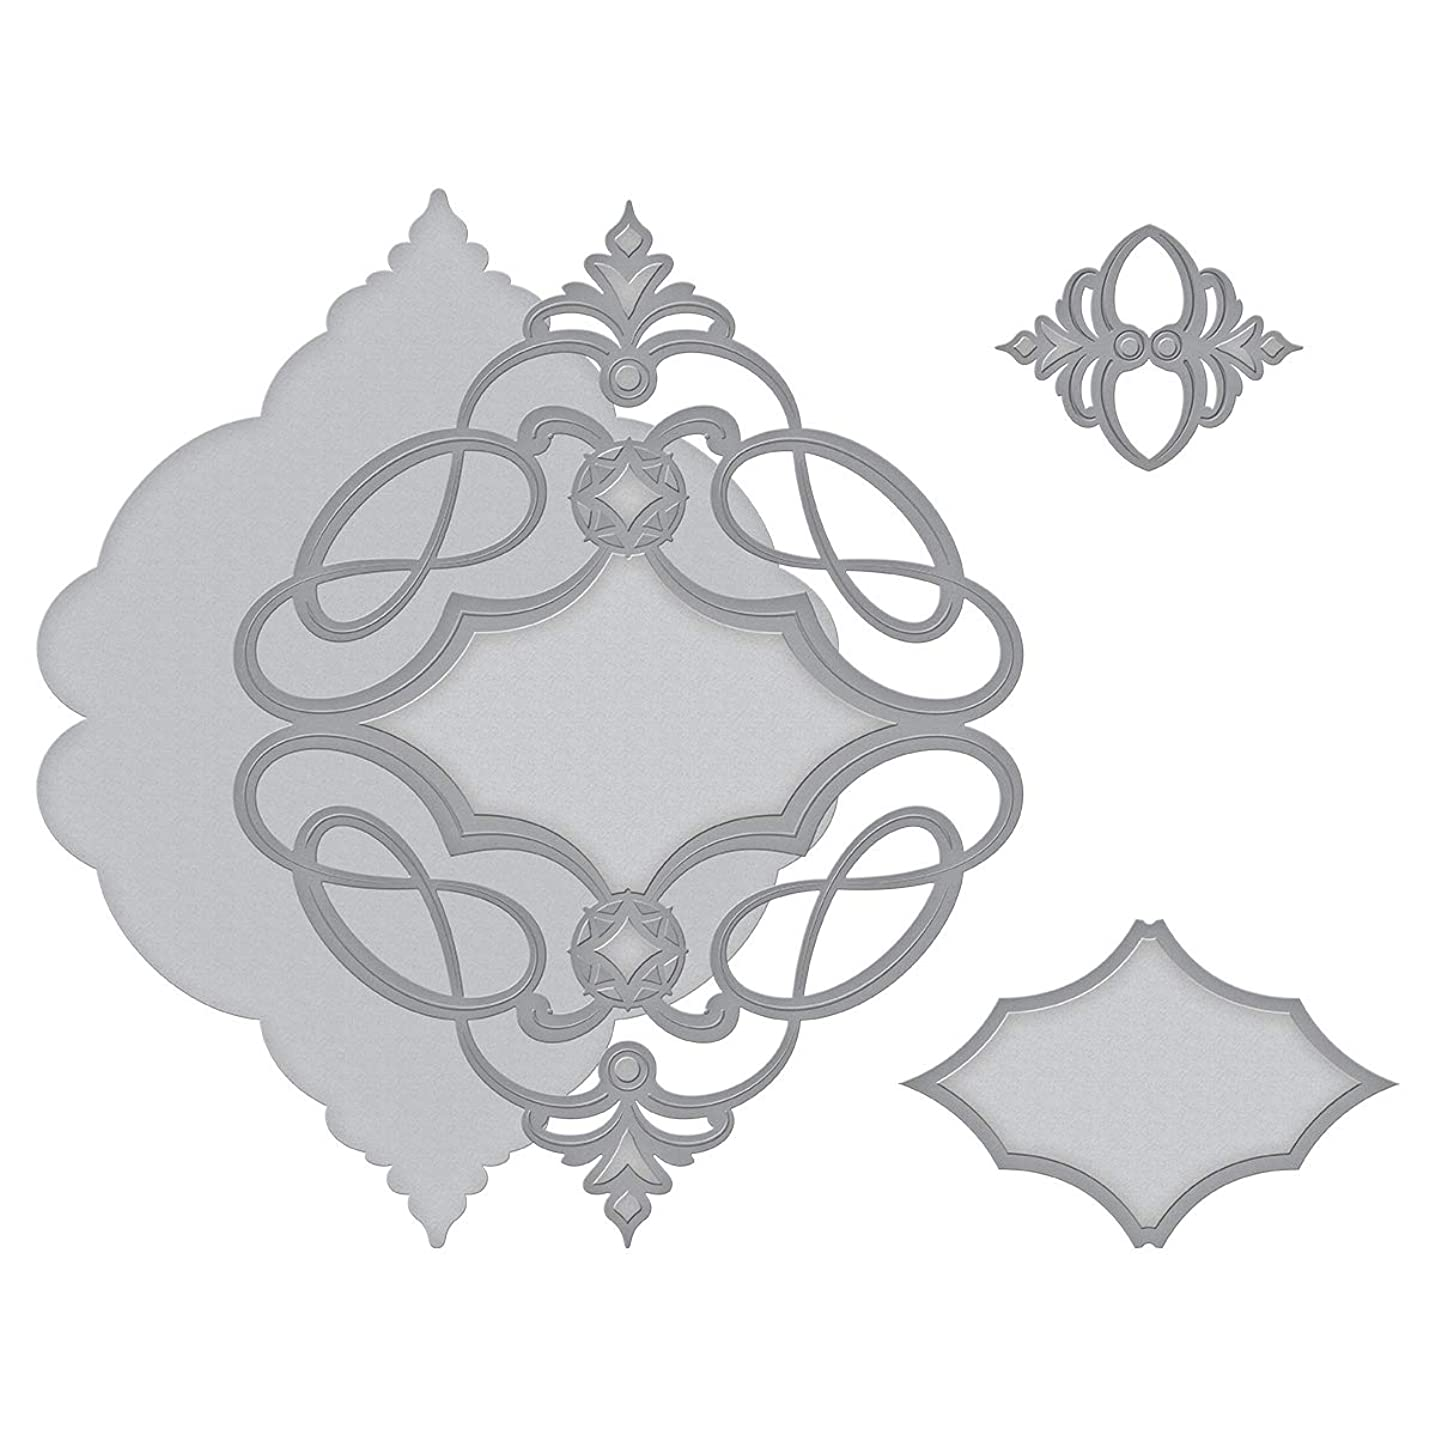 Spellbinders S4-994 Shapeabilities Marquise Diamond Pendant Etched/Wafer Thin Dies Metal